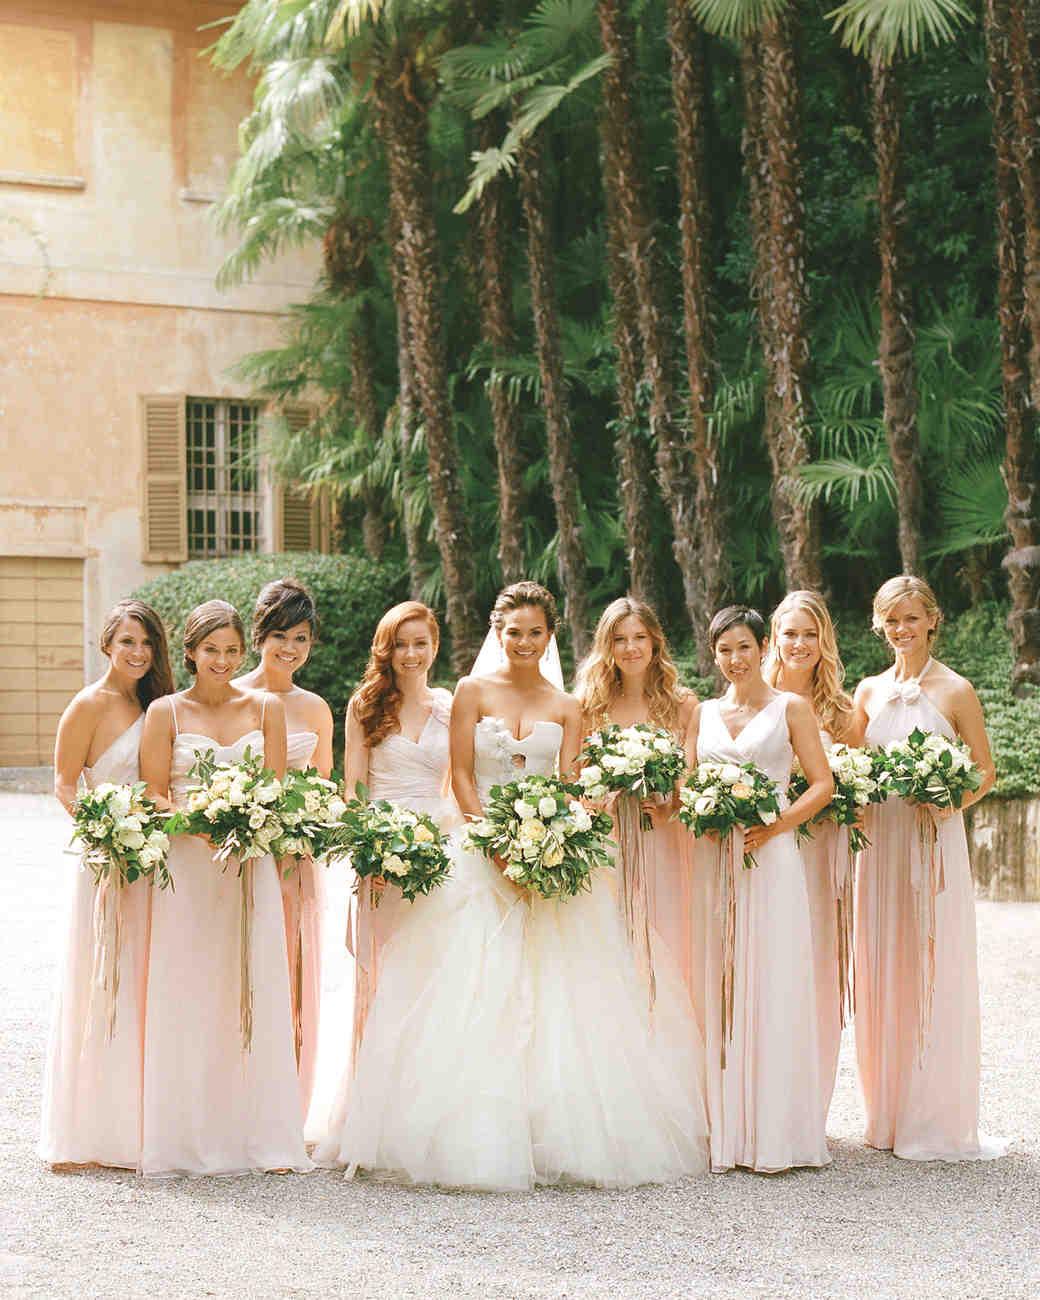 chrissy teigen and bridesmaids